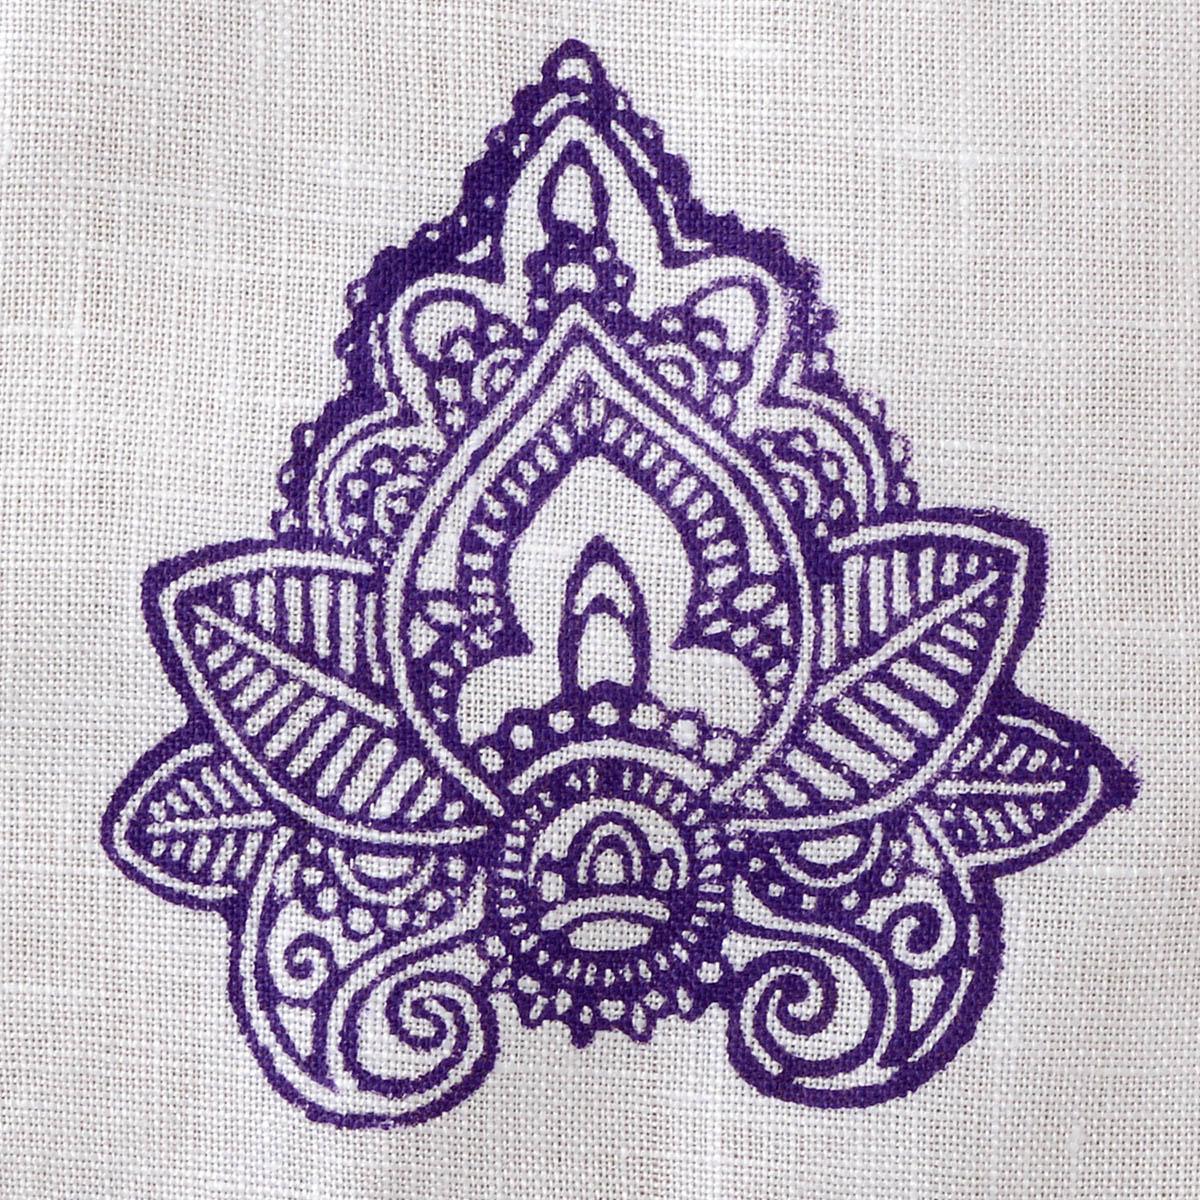 Fabric Creations™ Block Printing Stamps - Medium - Indian Leaf